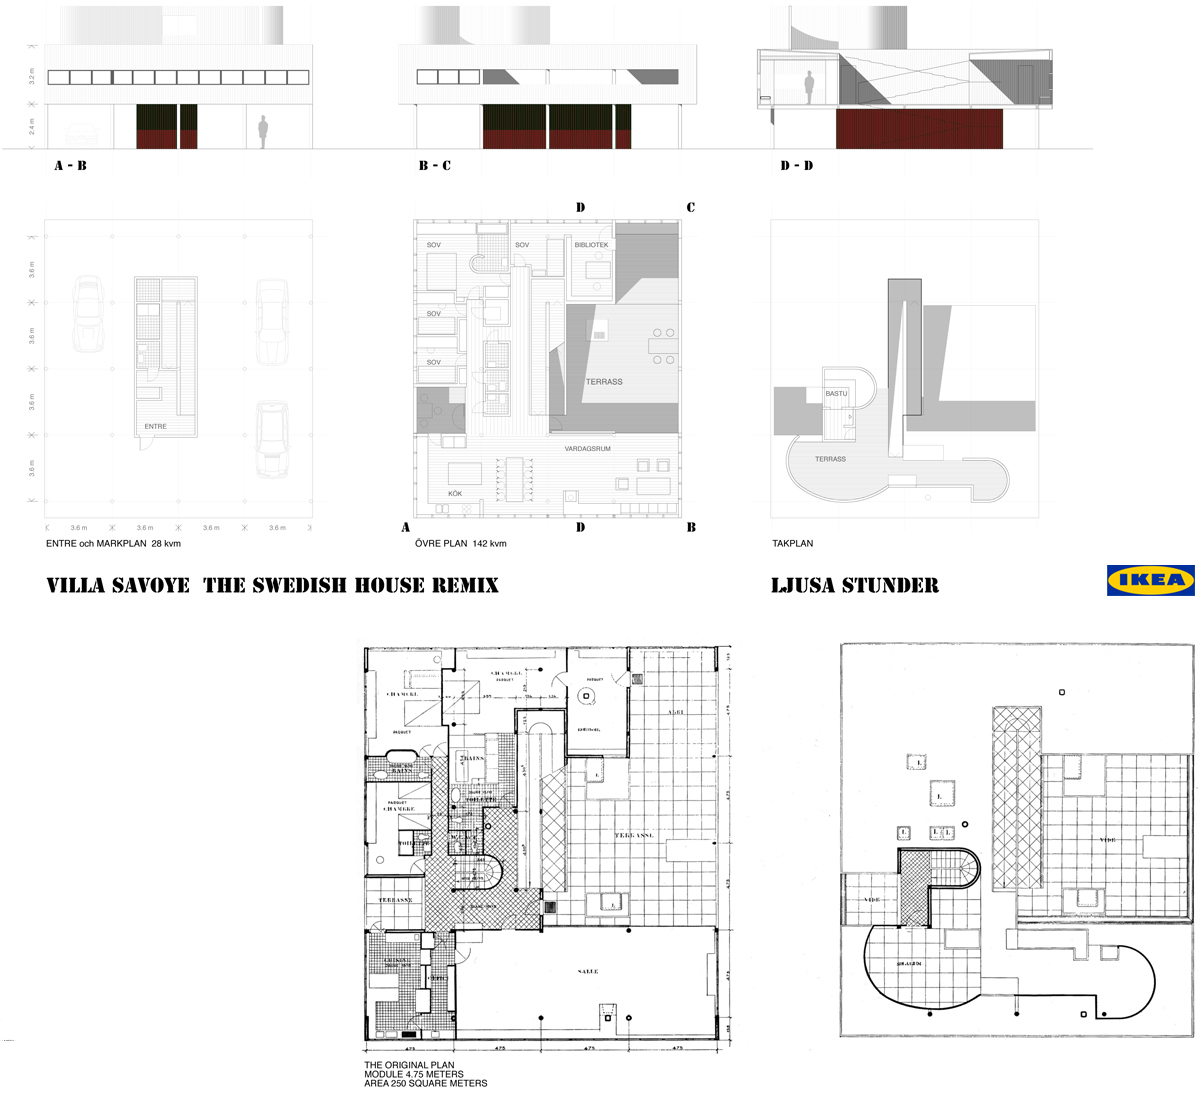 100 villa savoye floor plans gallery of le 100 villa for 100 floors floor 77